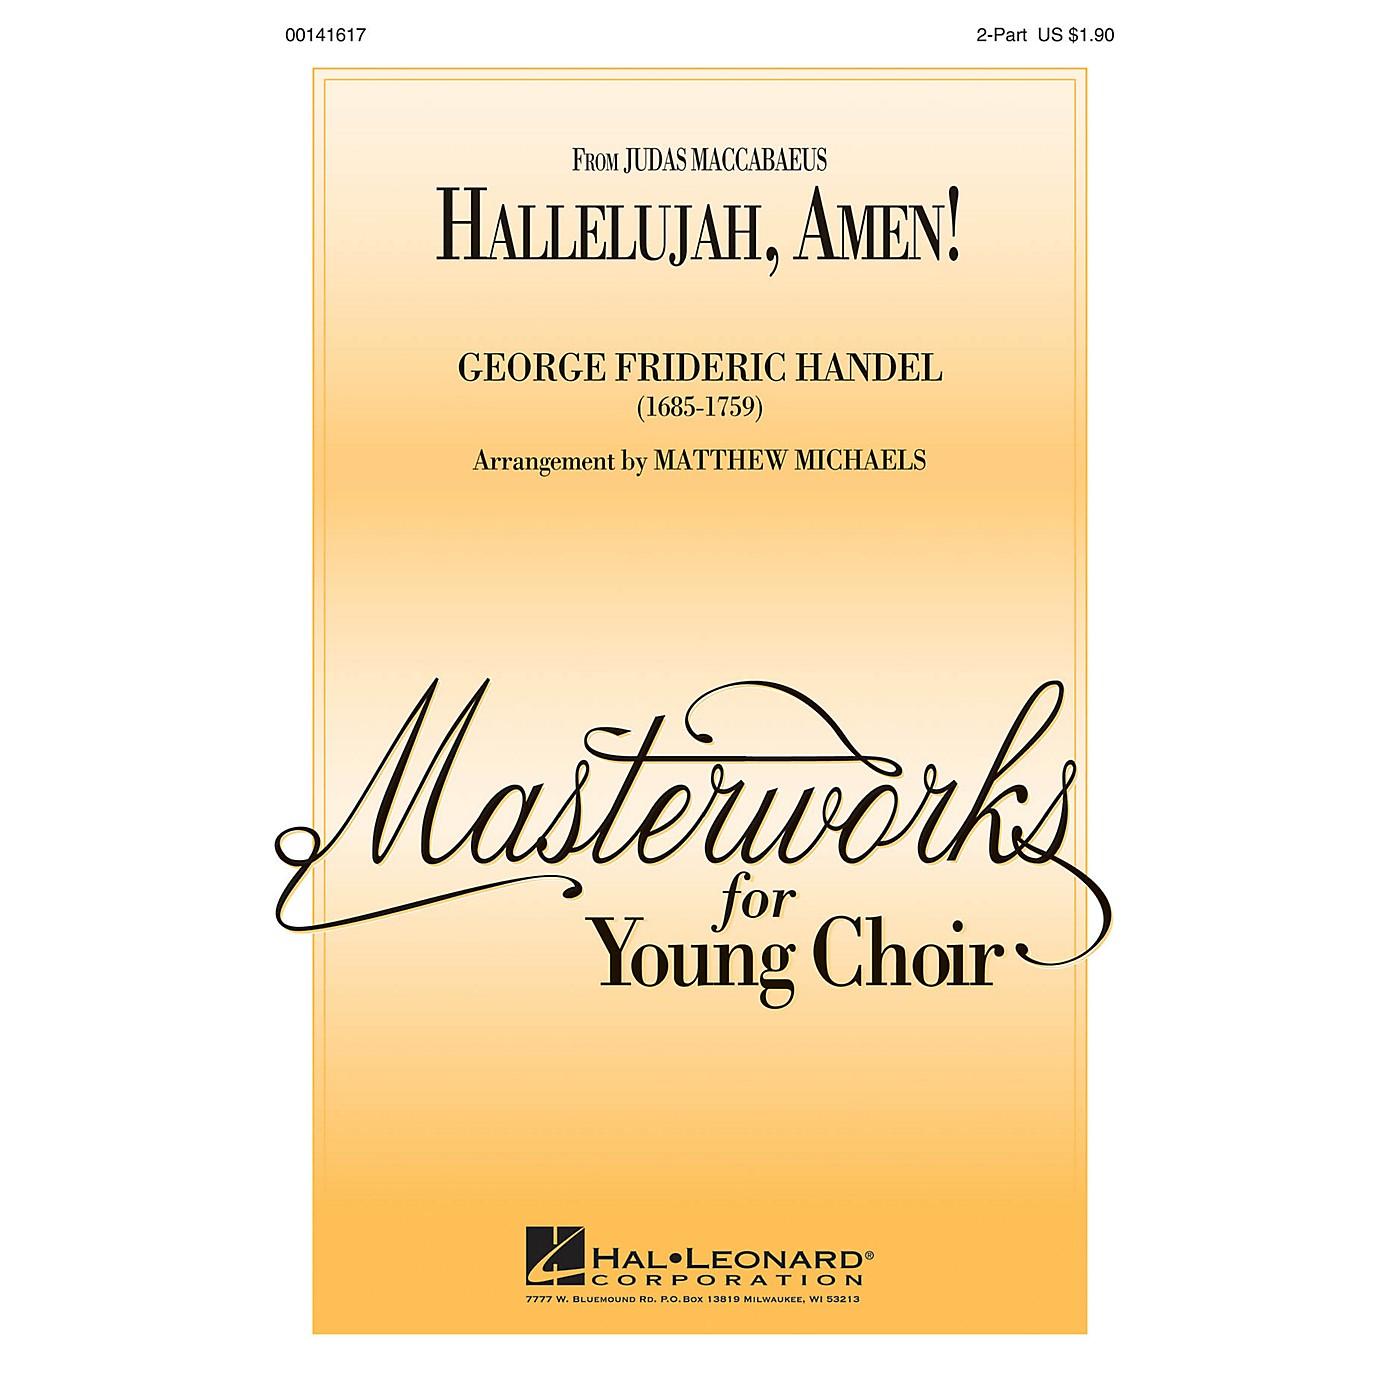 Hal Leonard Hallelujah, Amen! 2-Part arranged by Matthew Michaels thumbnail